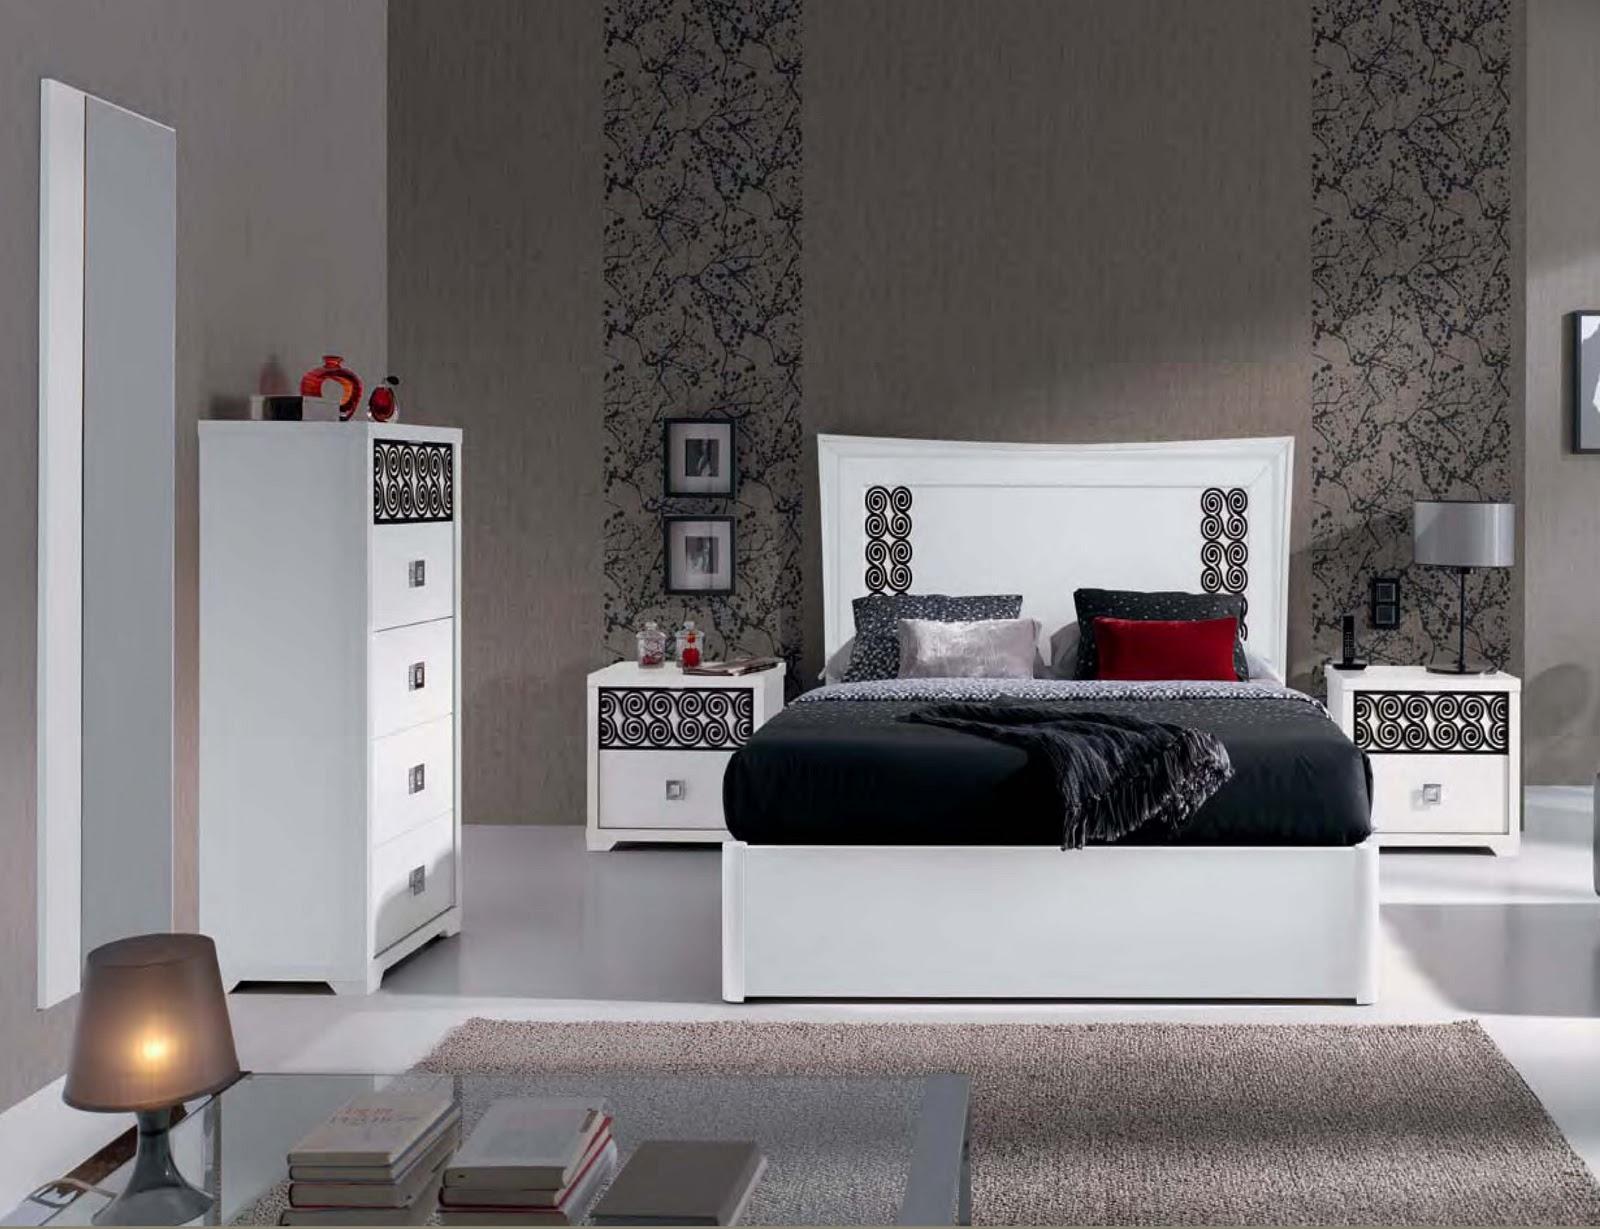 Muebles toscapino Xtd6 Muebles toscapino Dormitorios